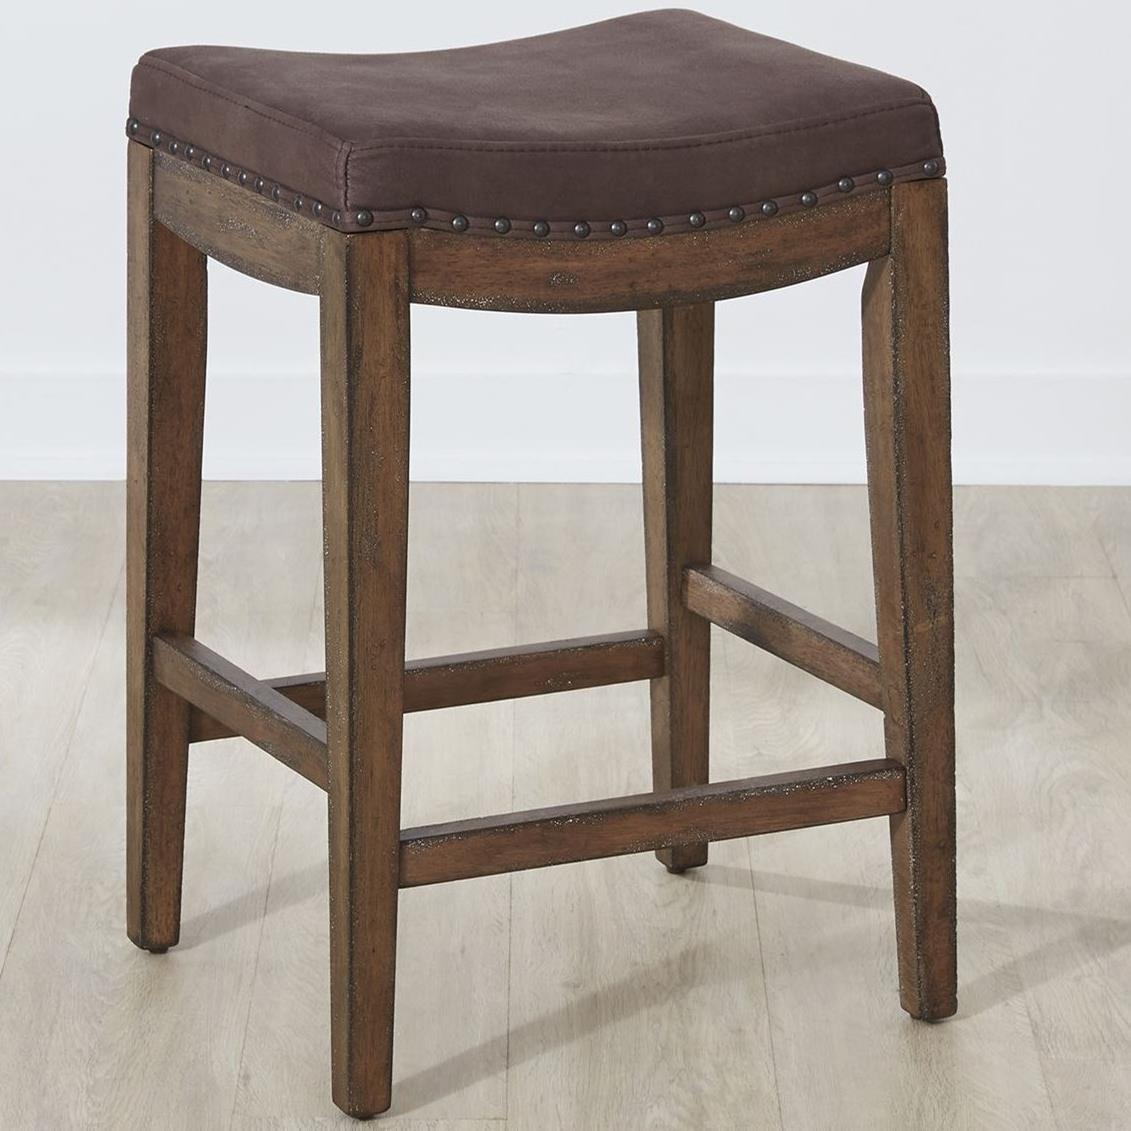 Aspen Skies Upholstered Barstool by Sarah Randolph Designs at Virginia Furniture Market